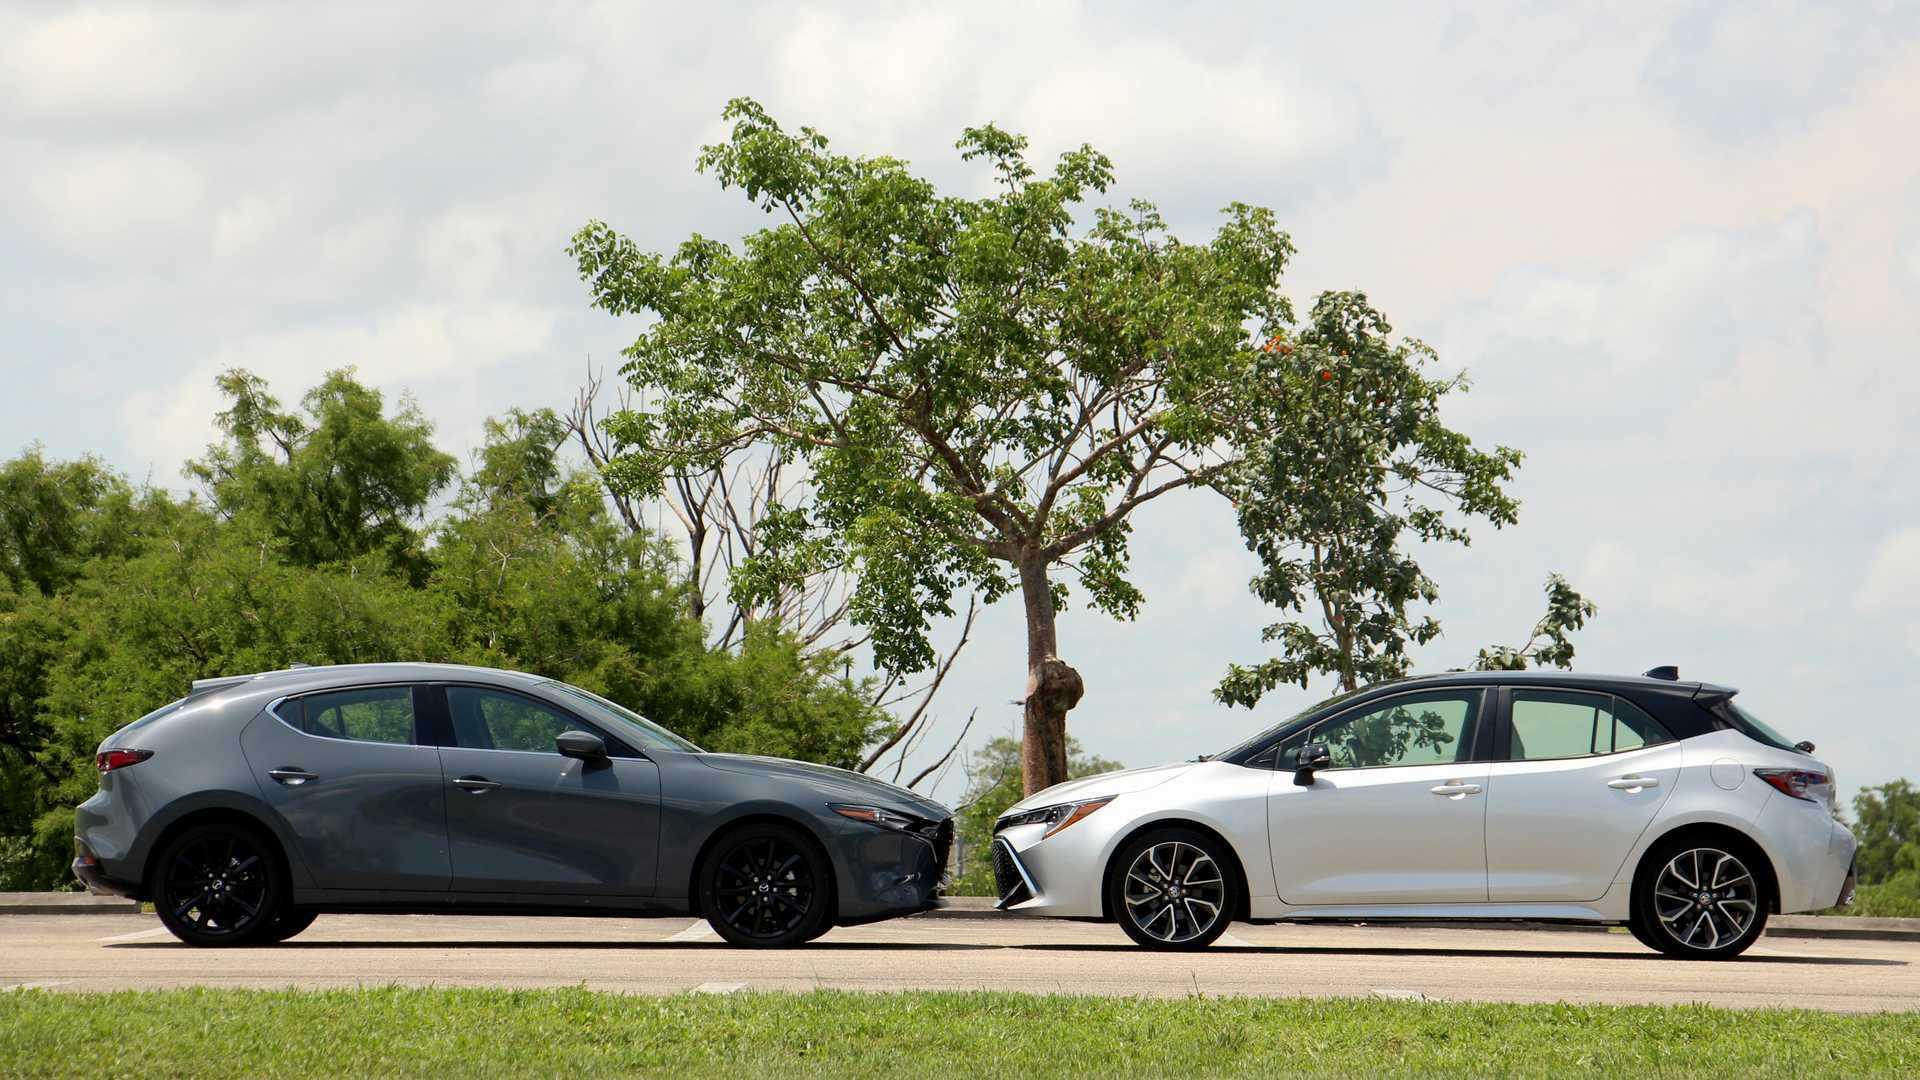 Mazda3 Vs Toyota Corolla Hatchback Comparison Two Fantastic Five Doors